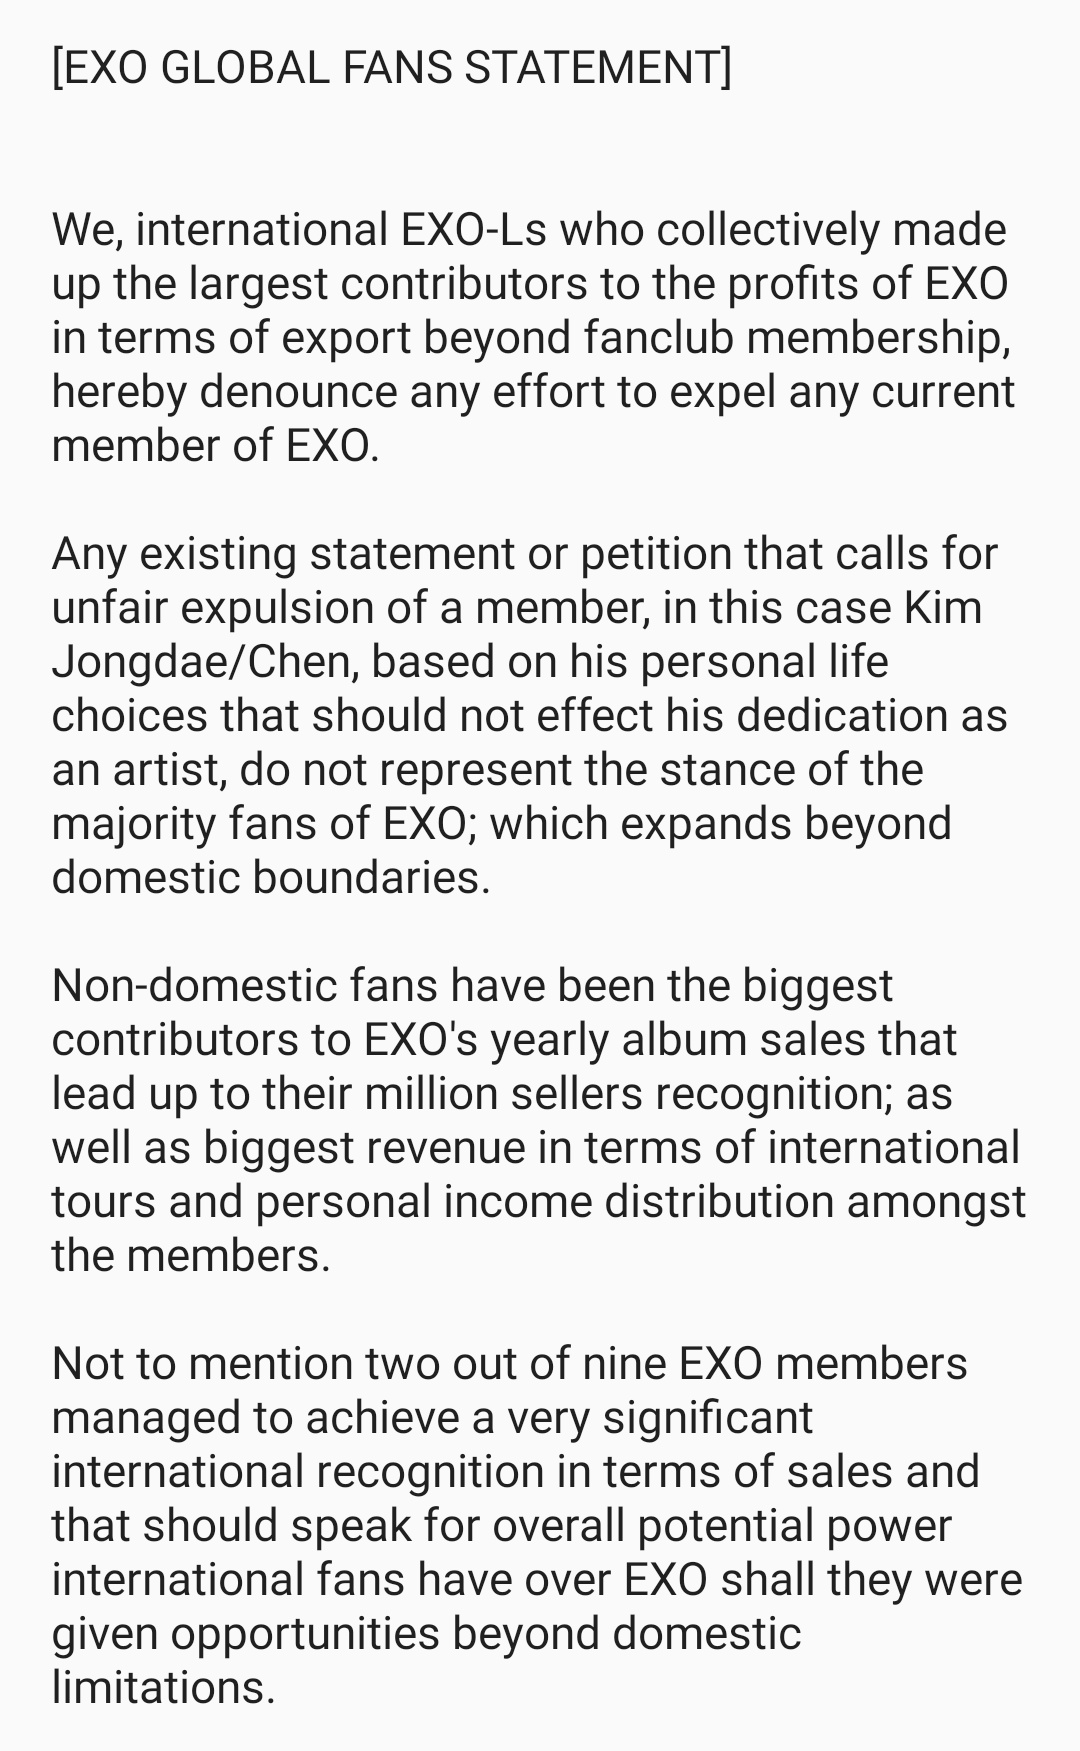 exo global statement 1